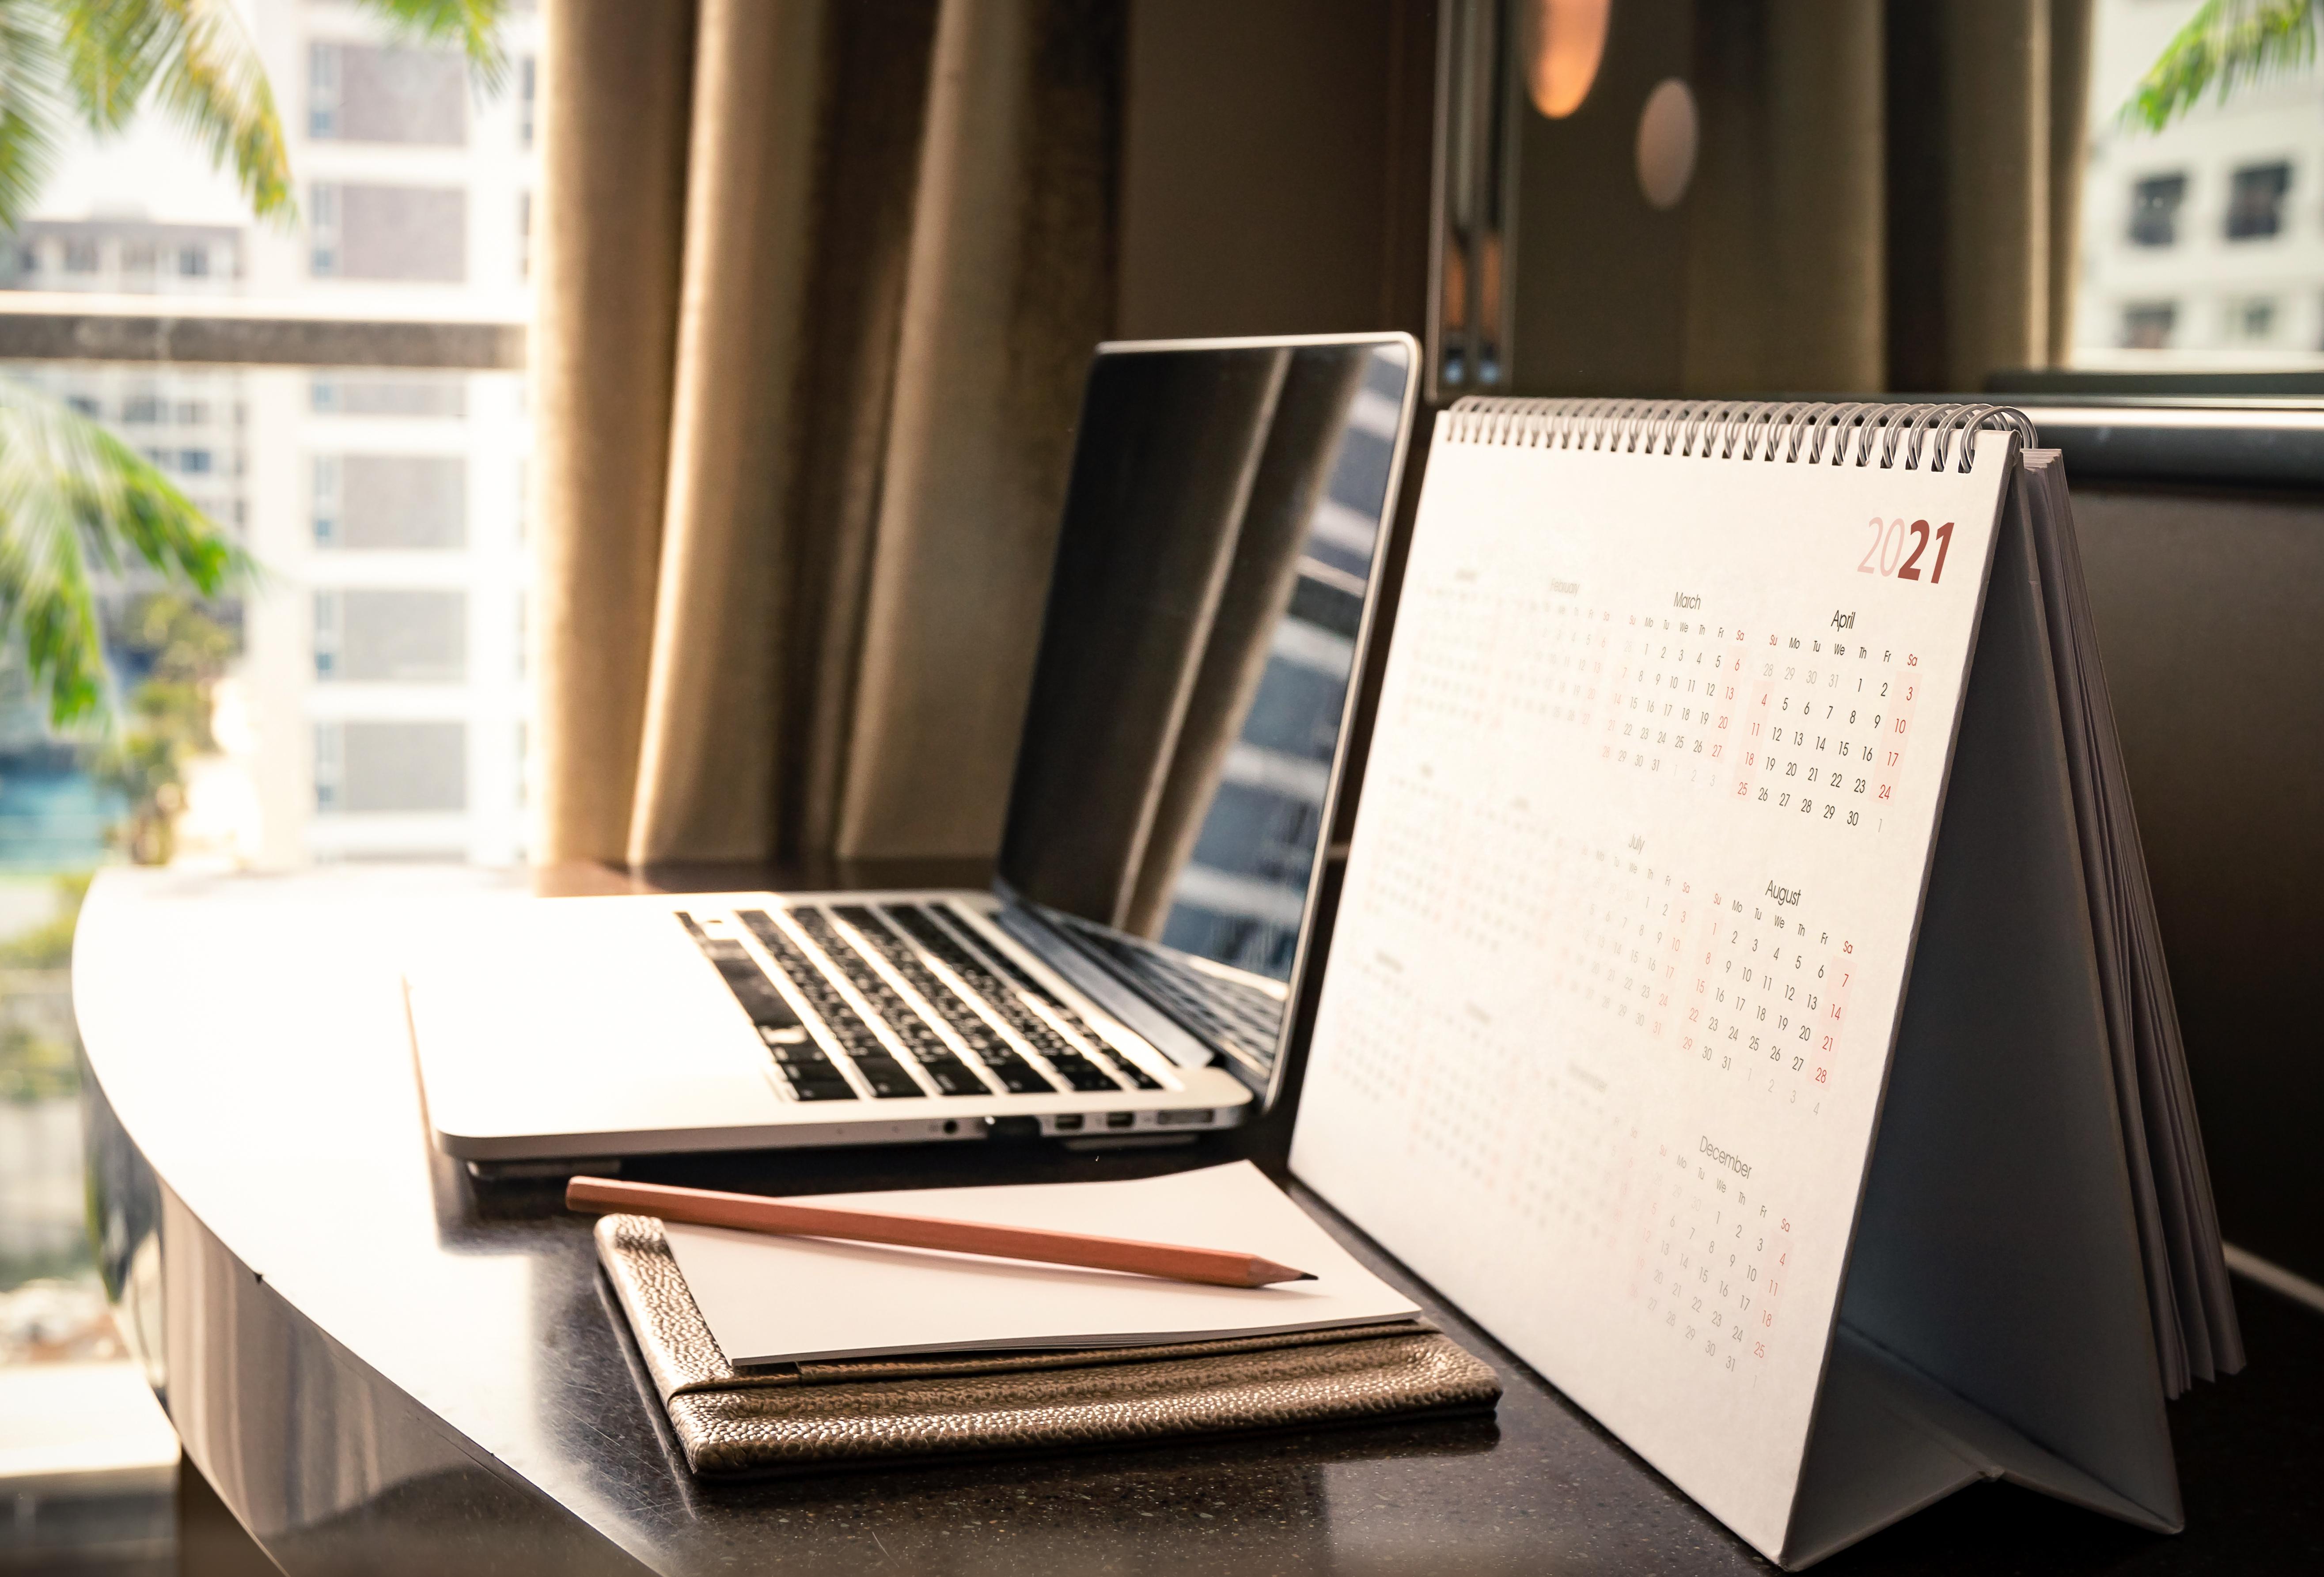 Laptop and calendar on desk